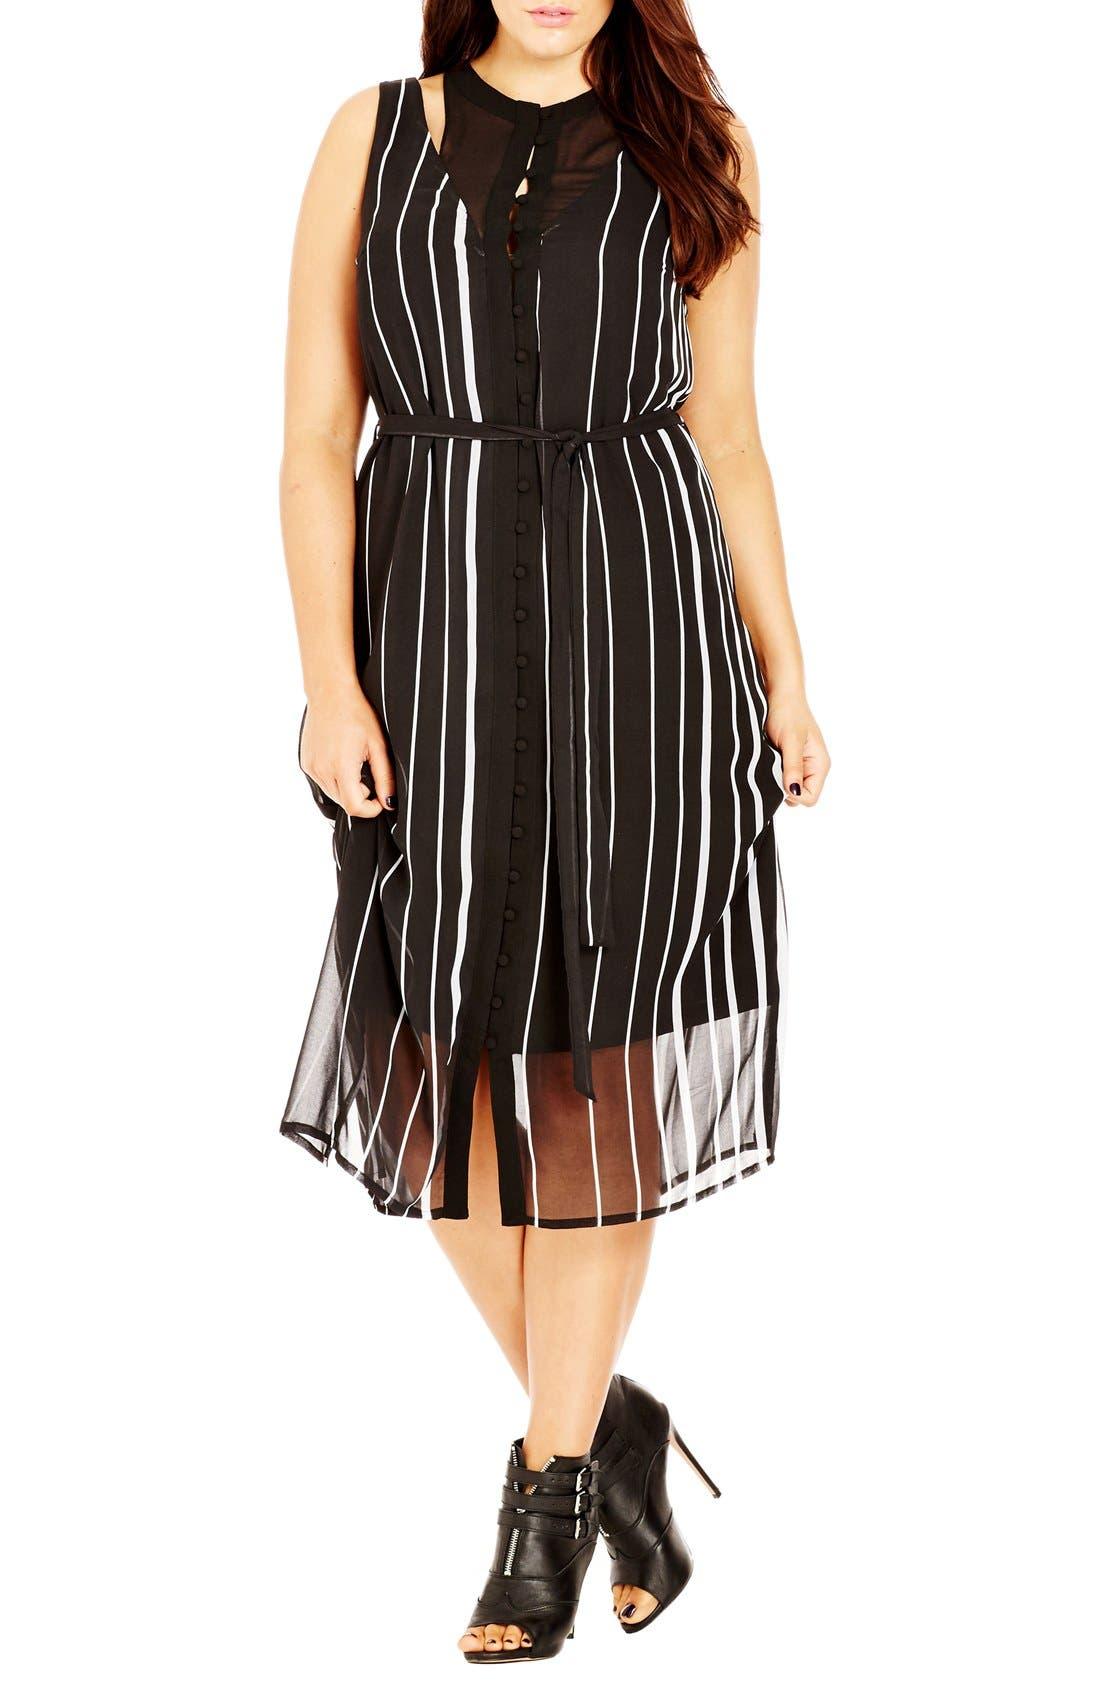 Main Image - City Chic 'Office Romance' Sheer Overlay Dress (Plus Size)